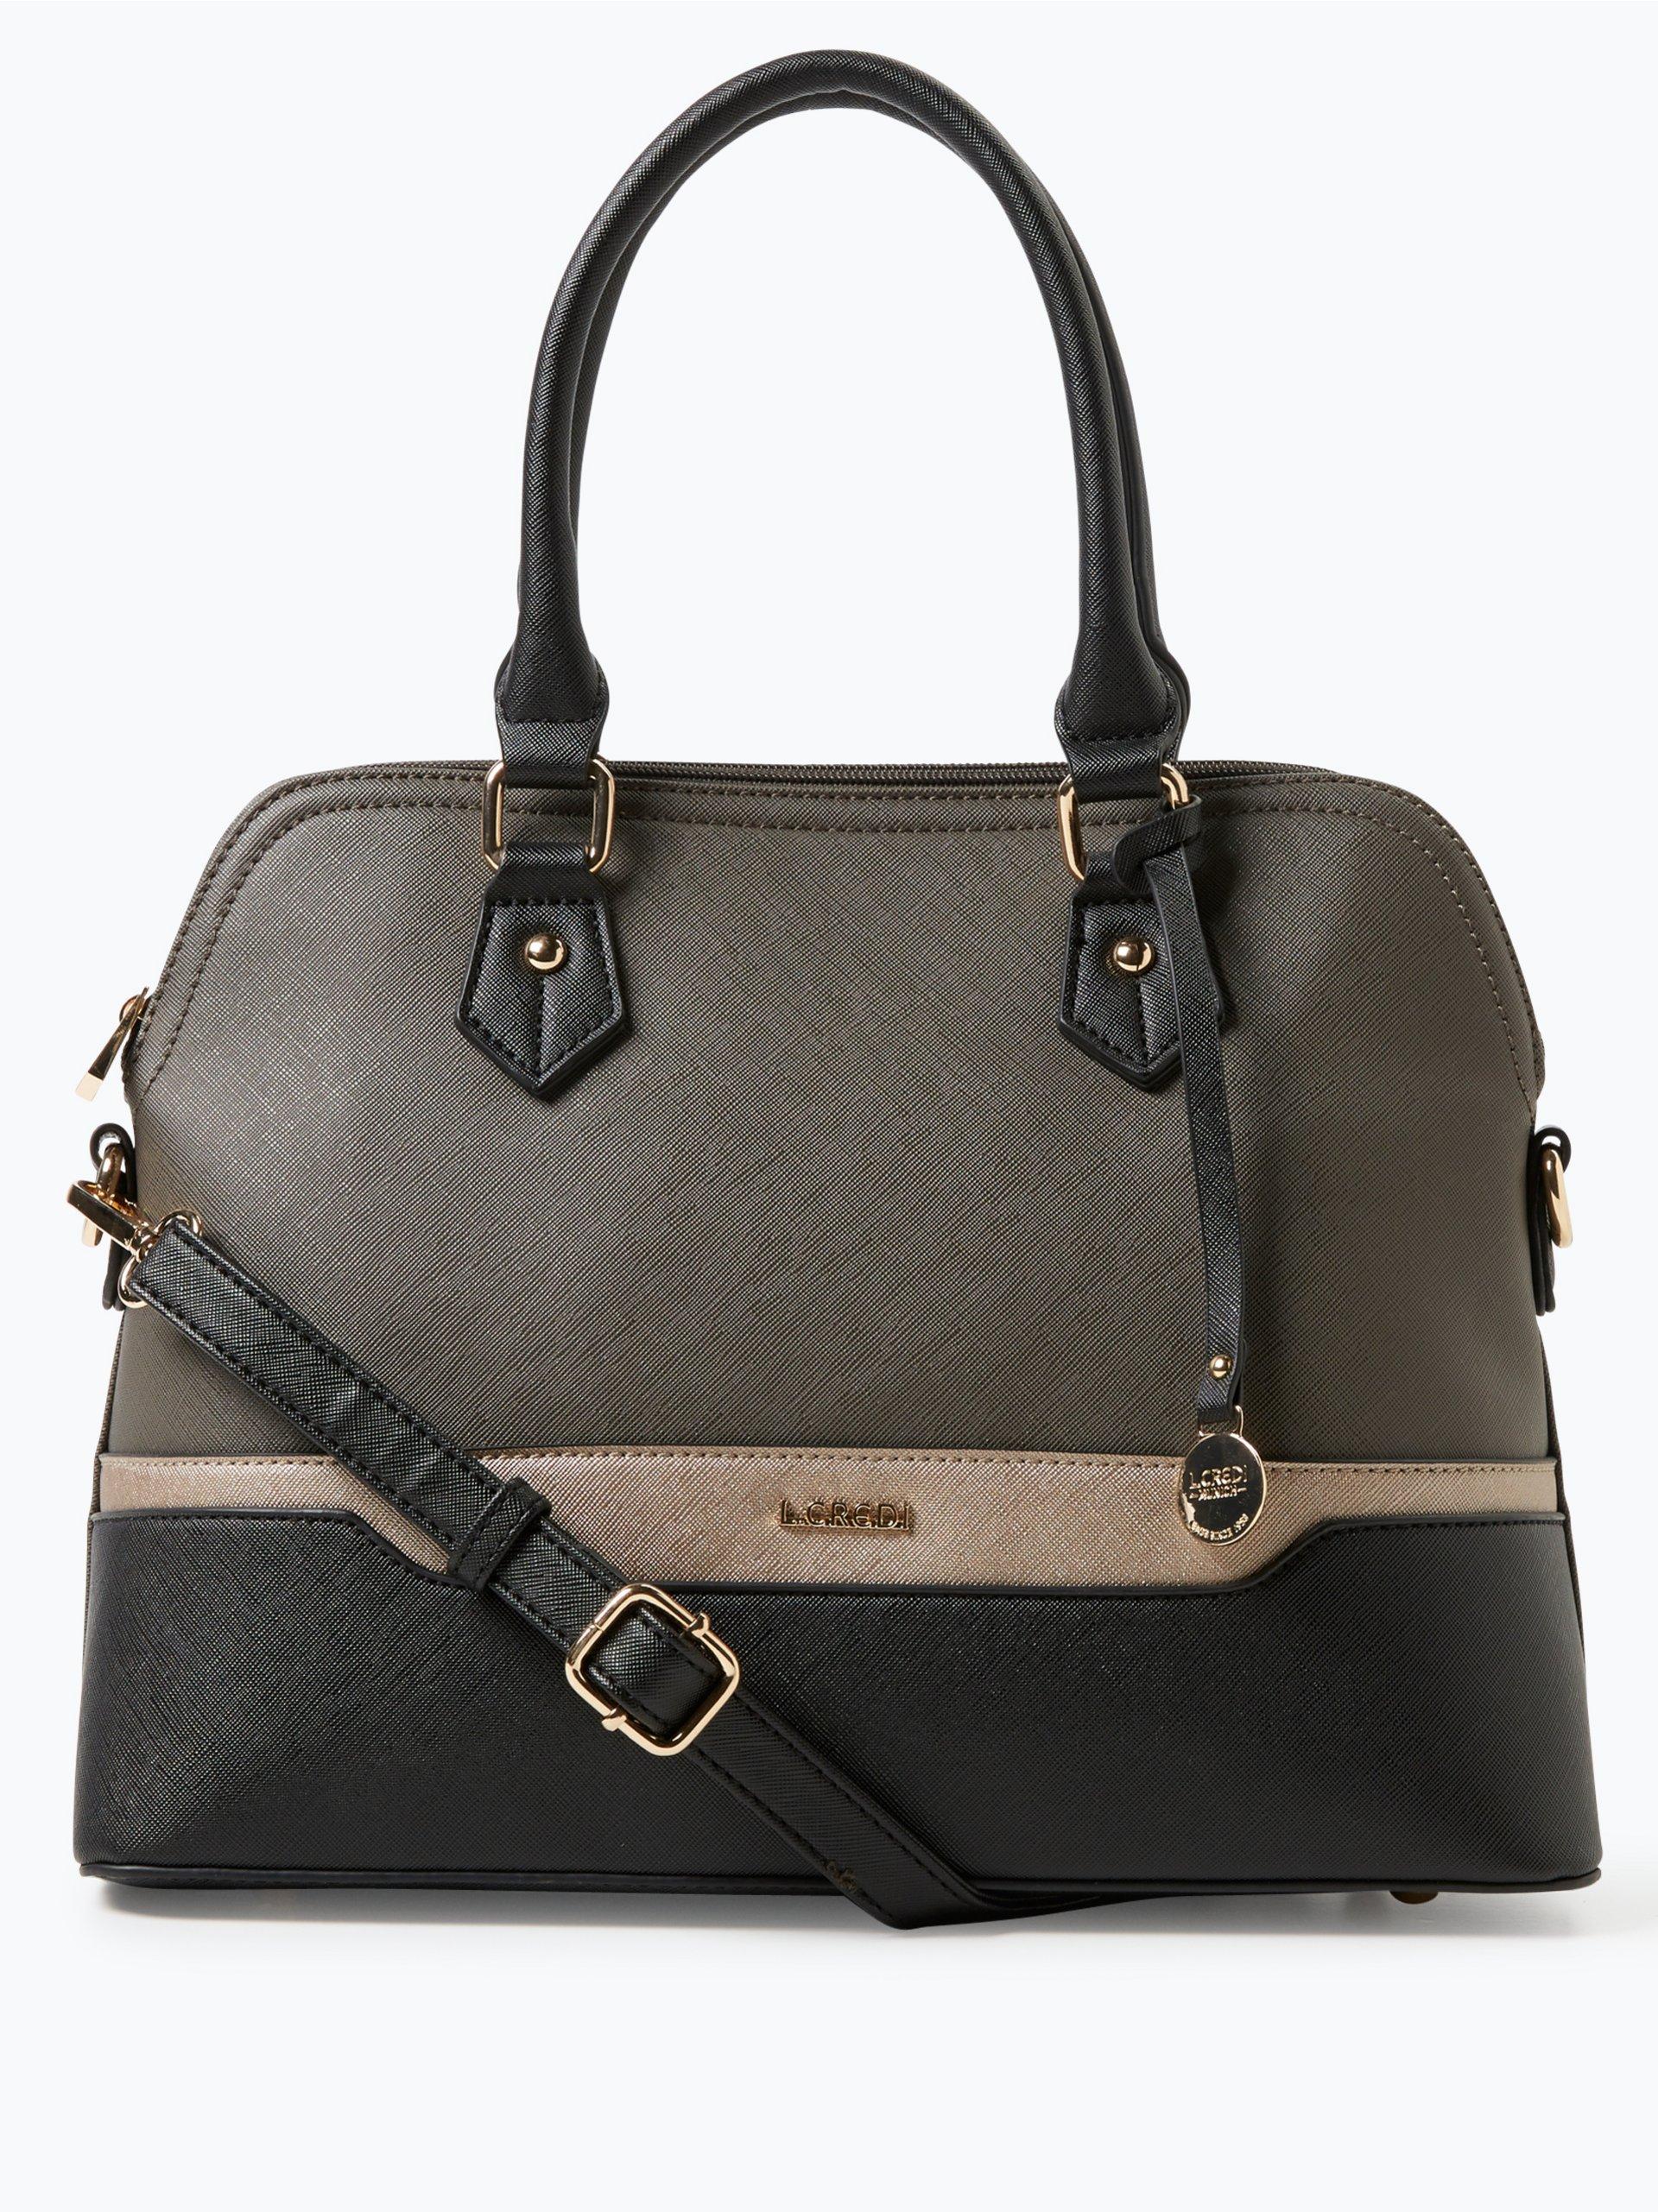 l credi damen handtasche in leder optik grau uni online kaufen peek und cloppenburg de. Black Bedroom Furniture Sets. Home Design Ideas